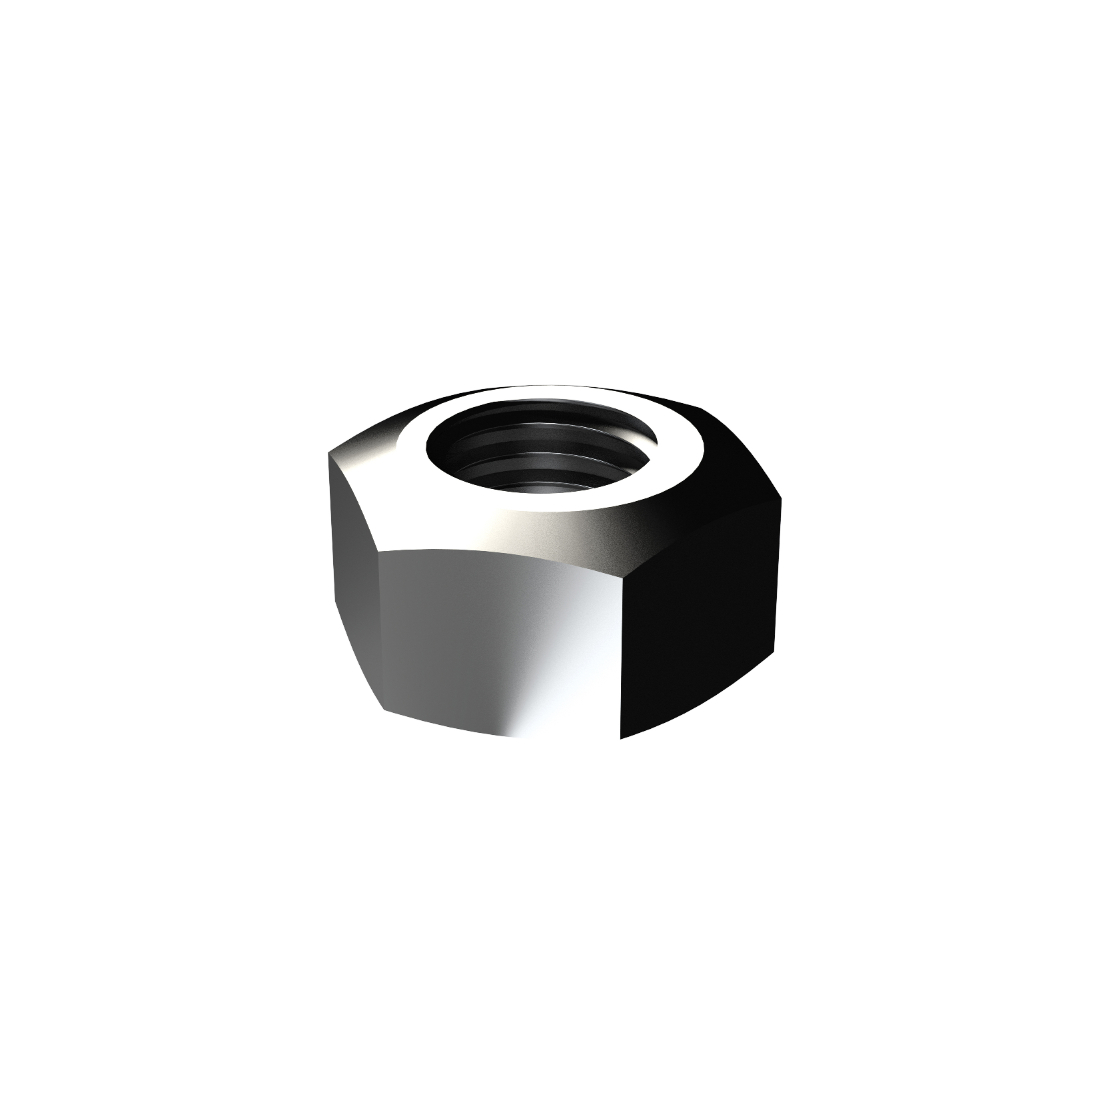 Hexagon Nut M12 T316 Stainless Steel NHHM61200N2